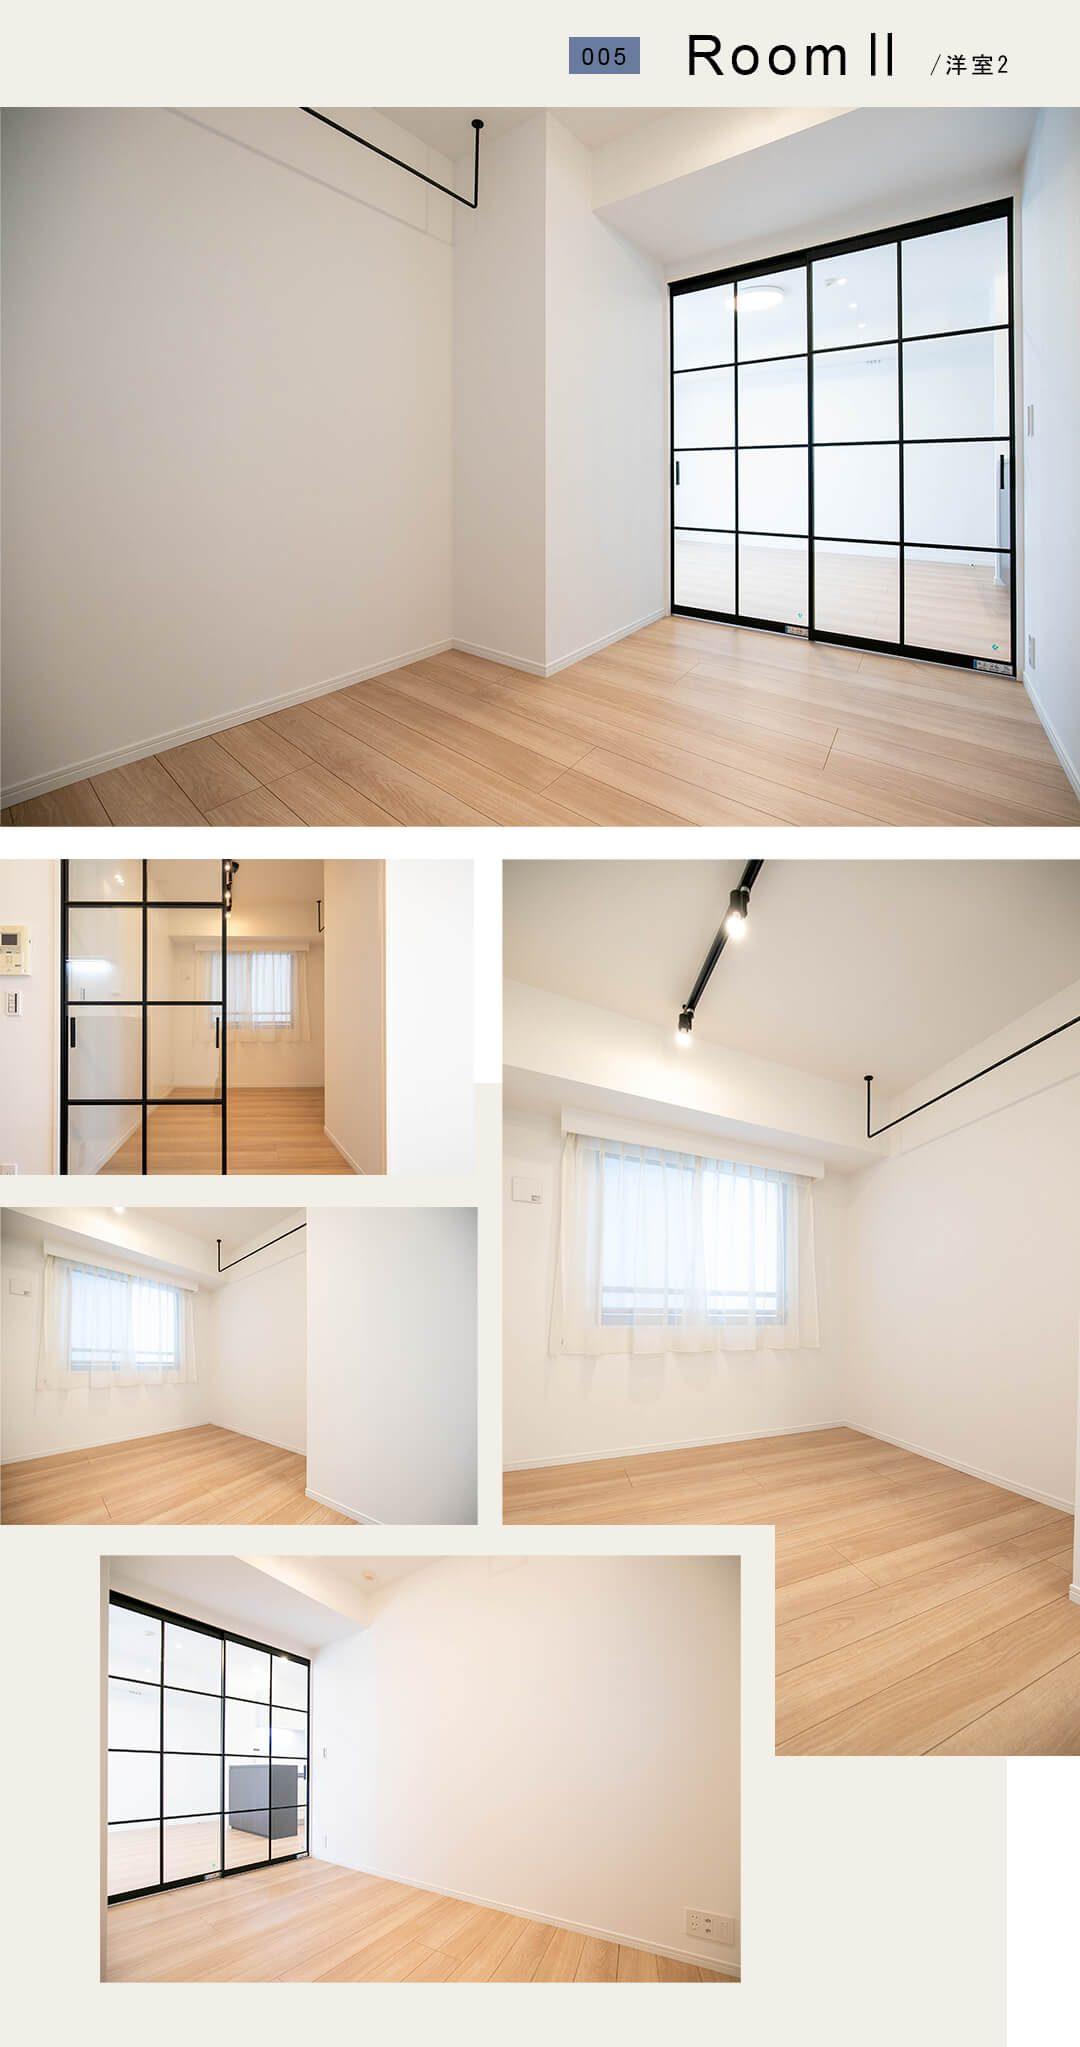 005,RoomⅡ,洋室2